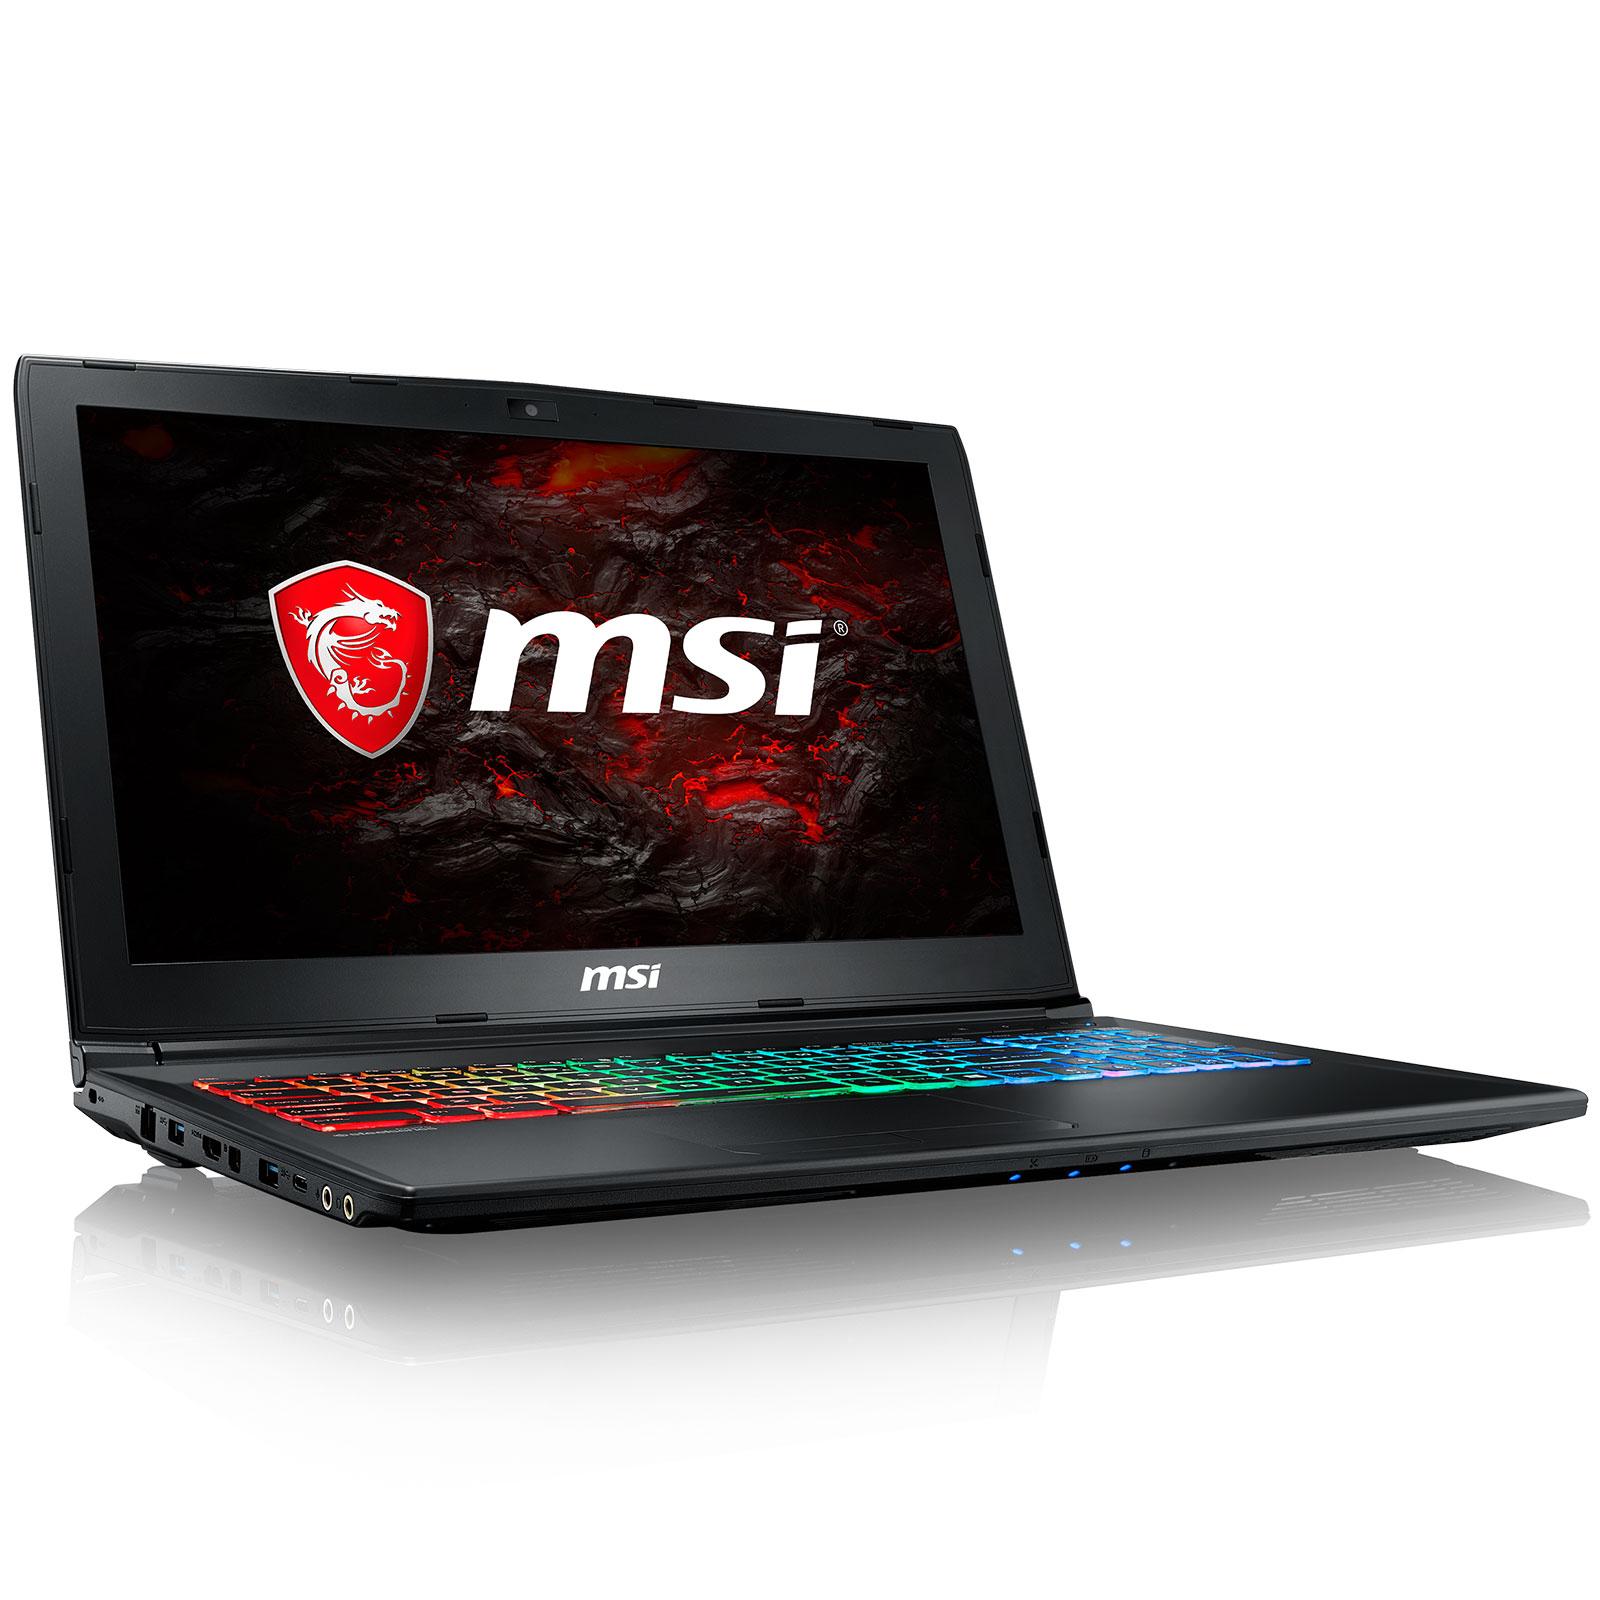 "PC portable MSI GP62MVR 7RFX-1010XFR Leopard Pro Intel Core i5-7300HQ 8 Go SSD 128 Go + HDD 1 To 15.6"" LED Full HD NVIDIA GeForce GTX 1060 6 Go Wi-Fi AC/Bluetooth Webcam FreeDOS (garantie constructeur 2 ans)"